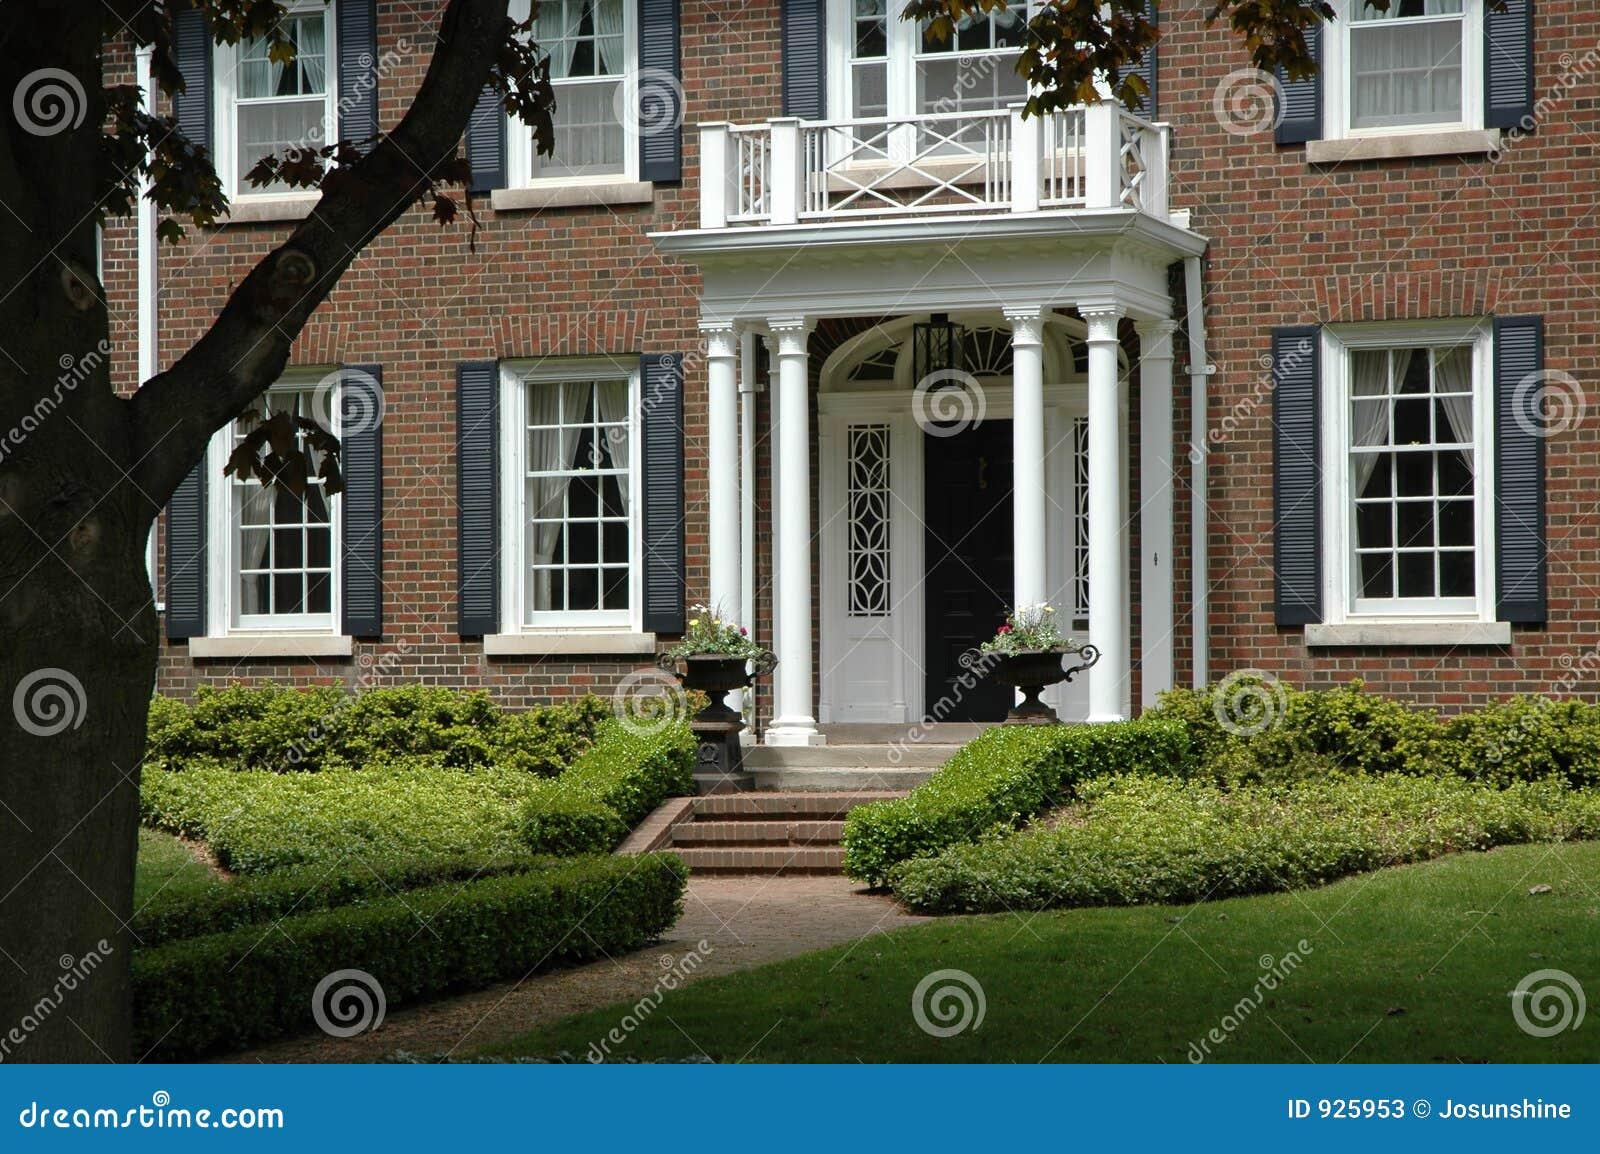 Red Brick House Stock Image Image Of Season Architecture 925953